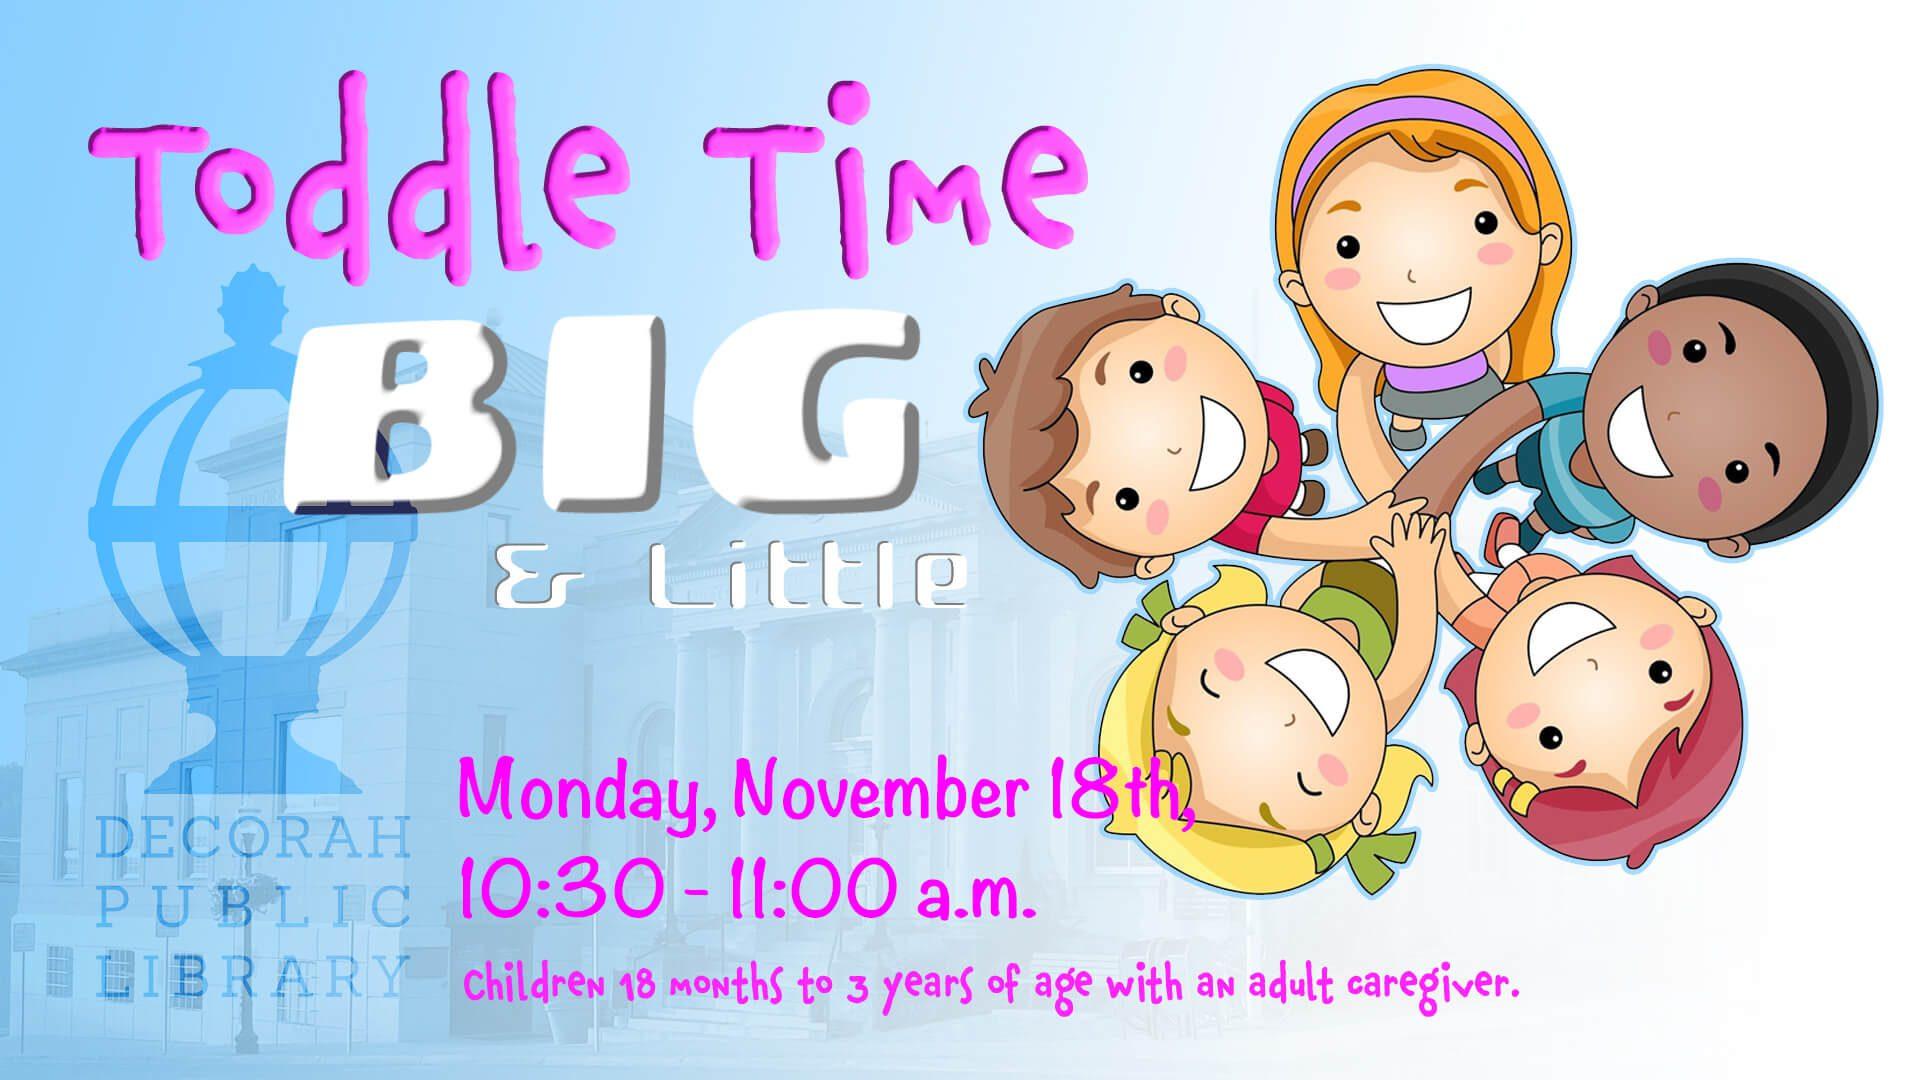 Toddle Time Nov. 18